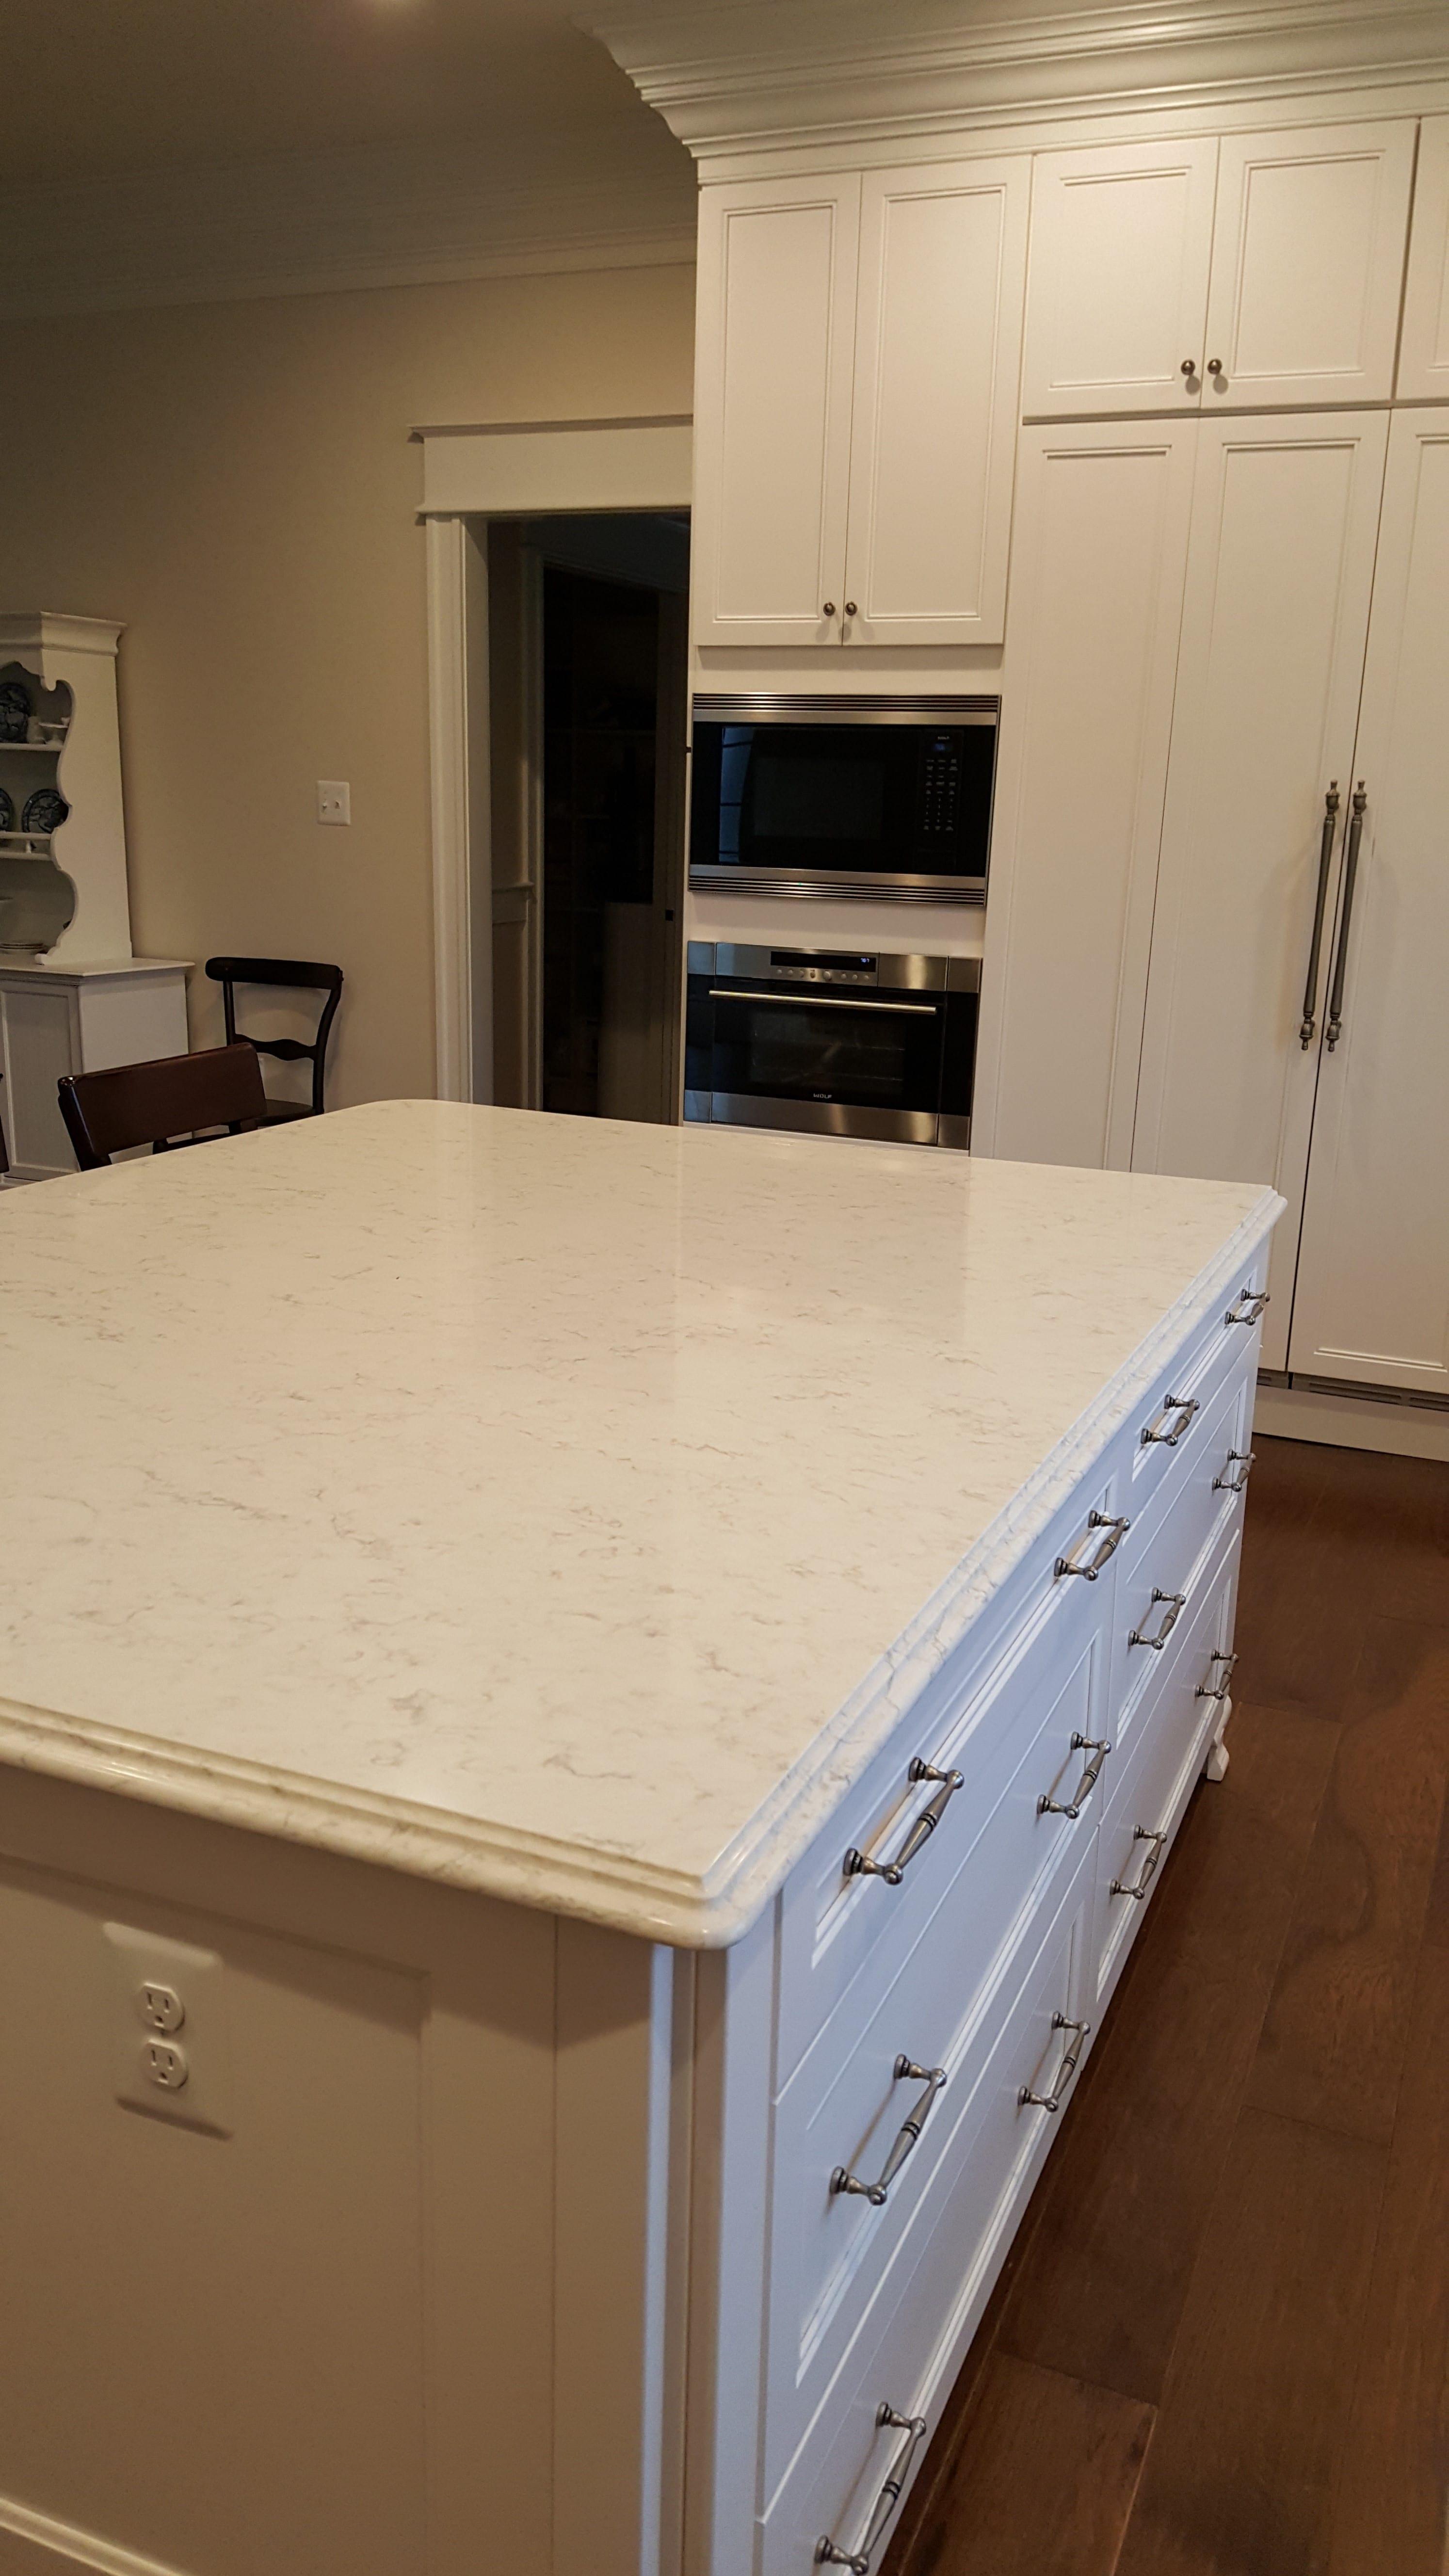 Granite Kitchen Golden Cascade Viaterra 2 DSCF5358 Viaterra